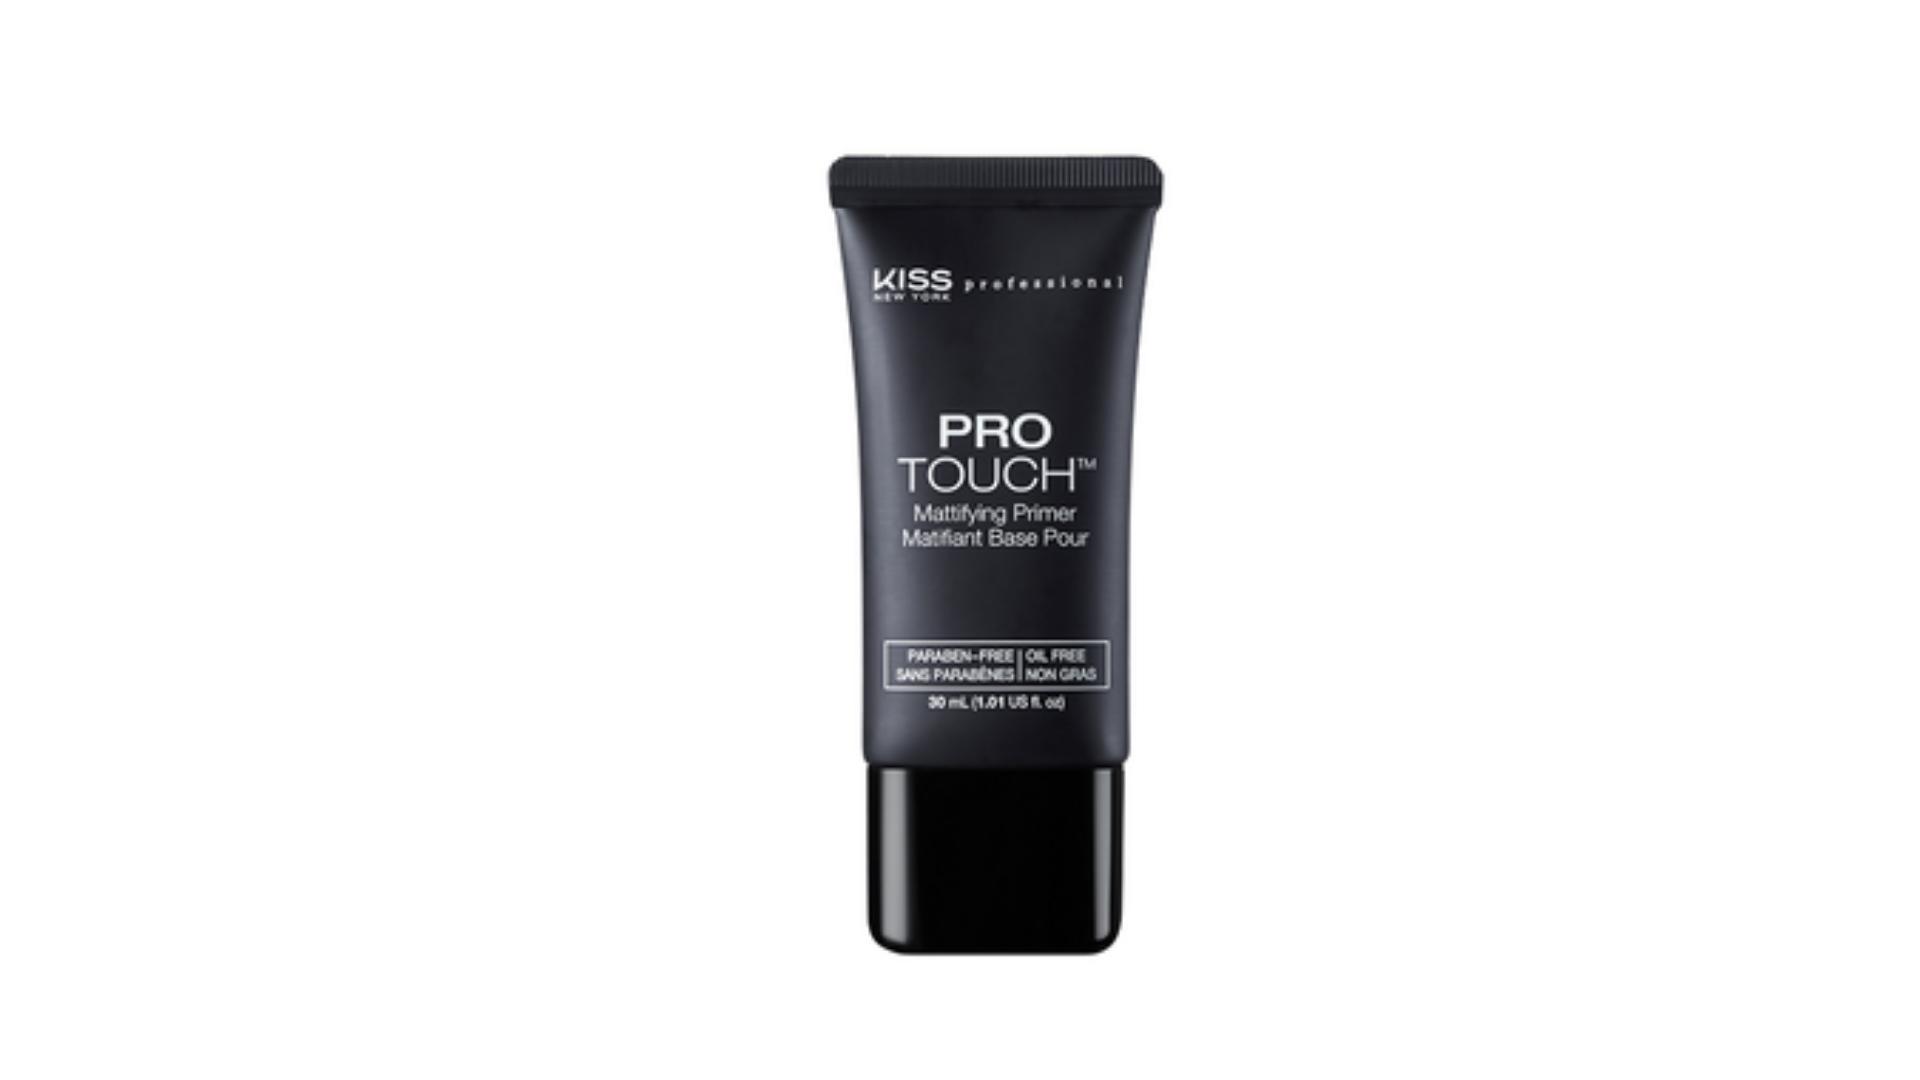 Матирующий праймер для жирной кожи Protouch, Kiss New York Professional